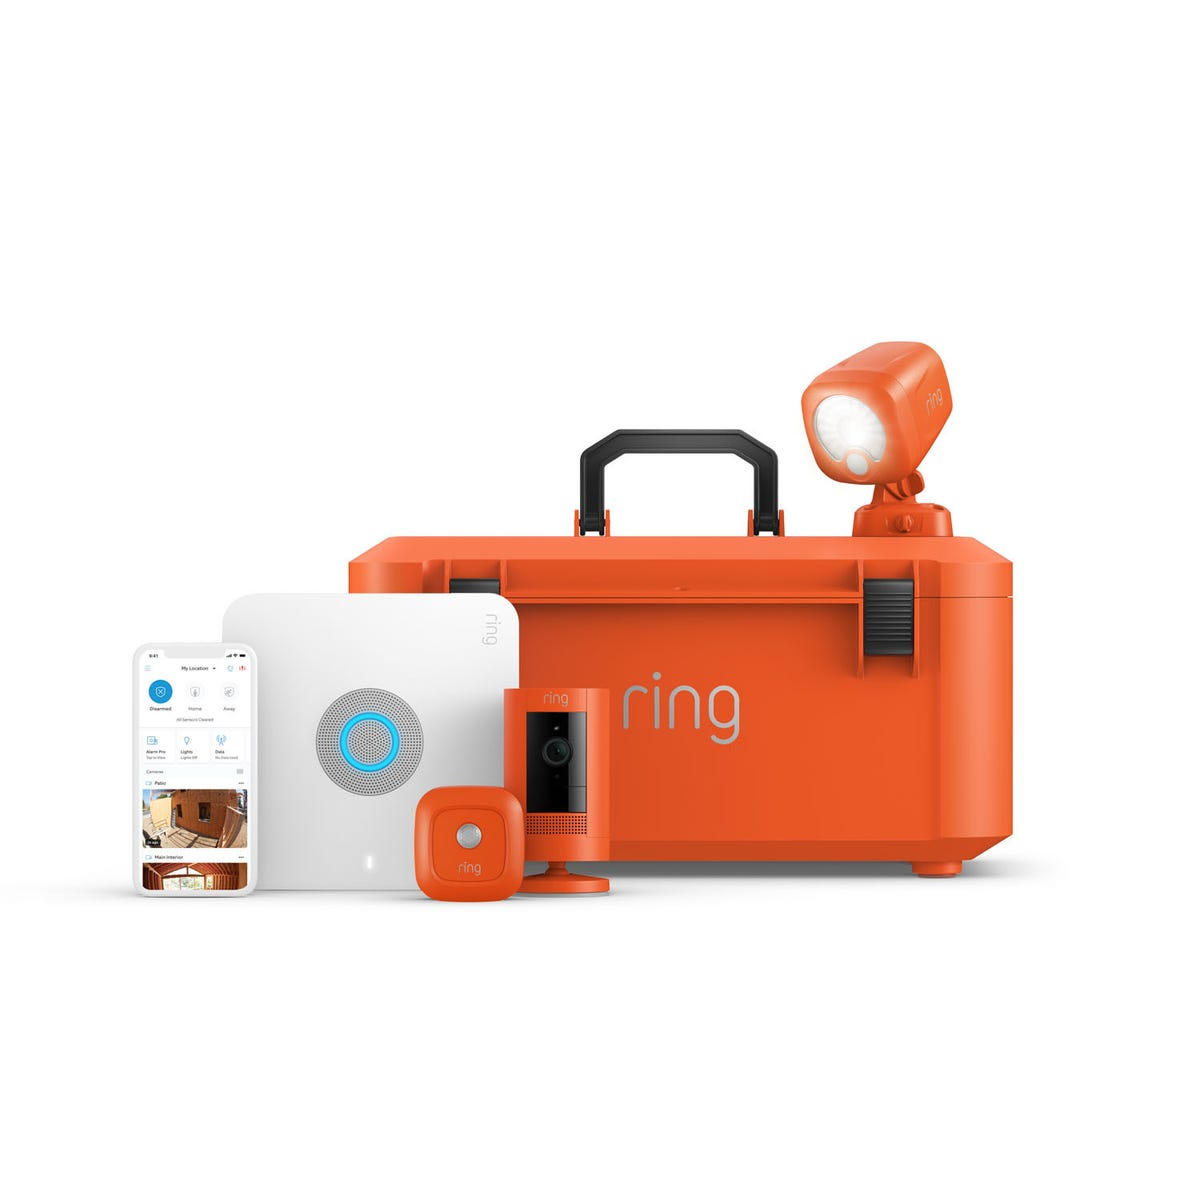 20210621-lockup-jobsitesecurity-5pc-orange-rgb-1500x1500.jpg